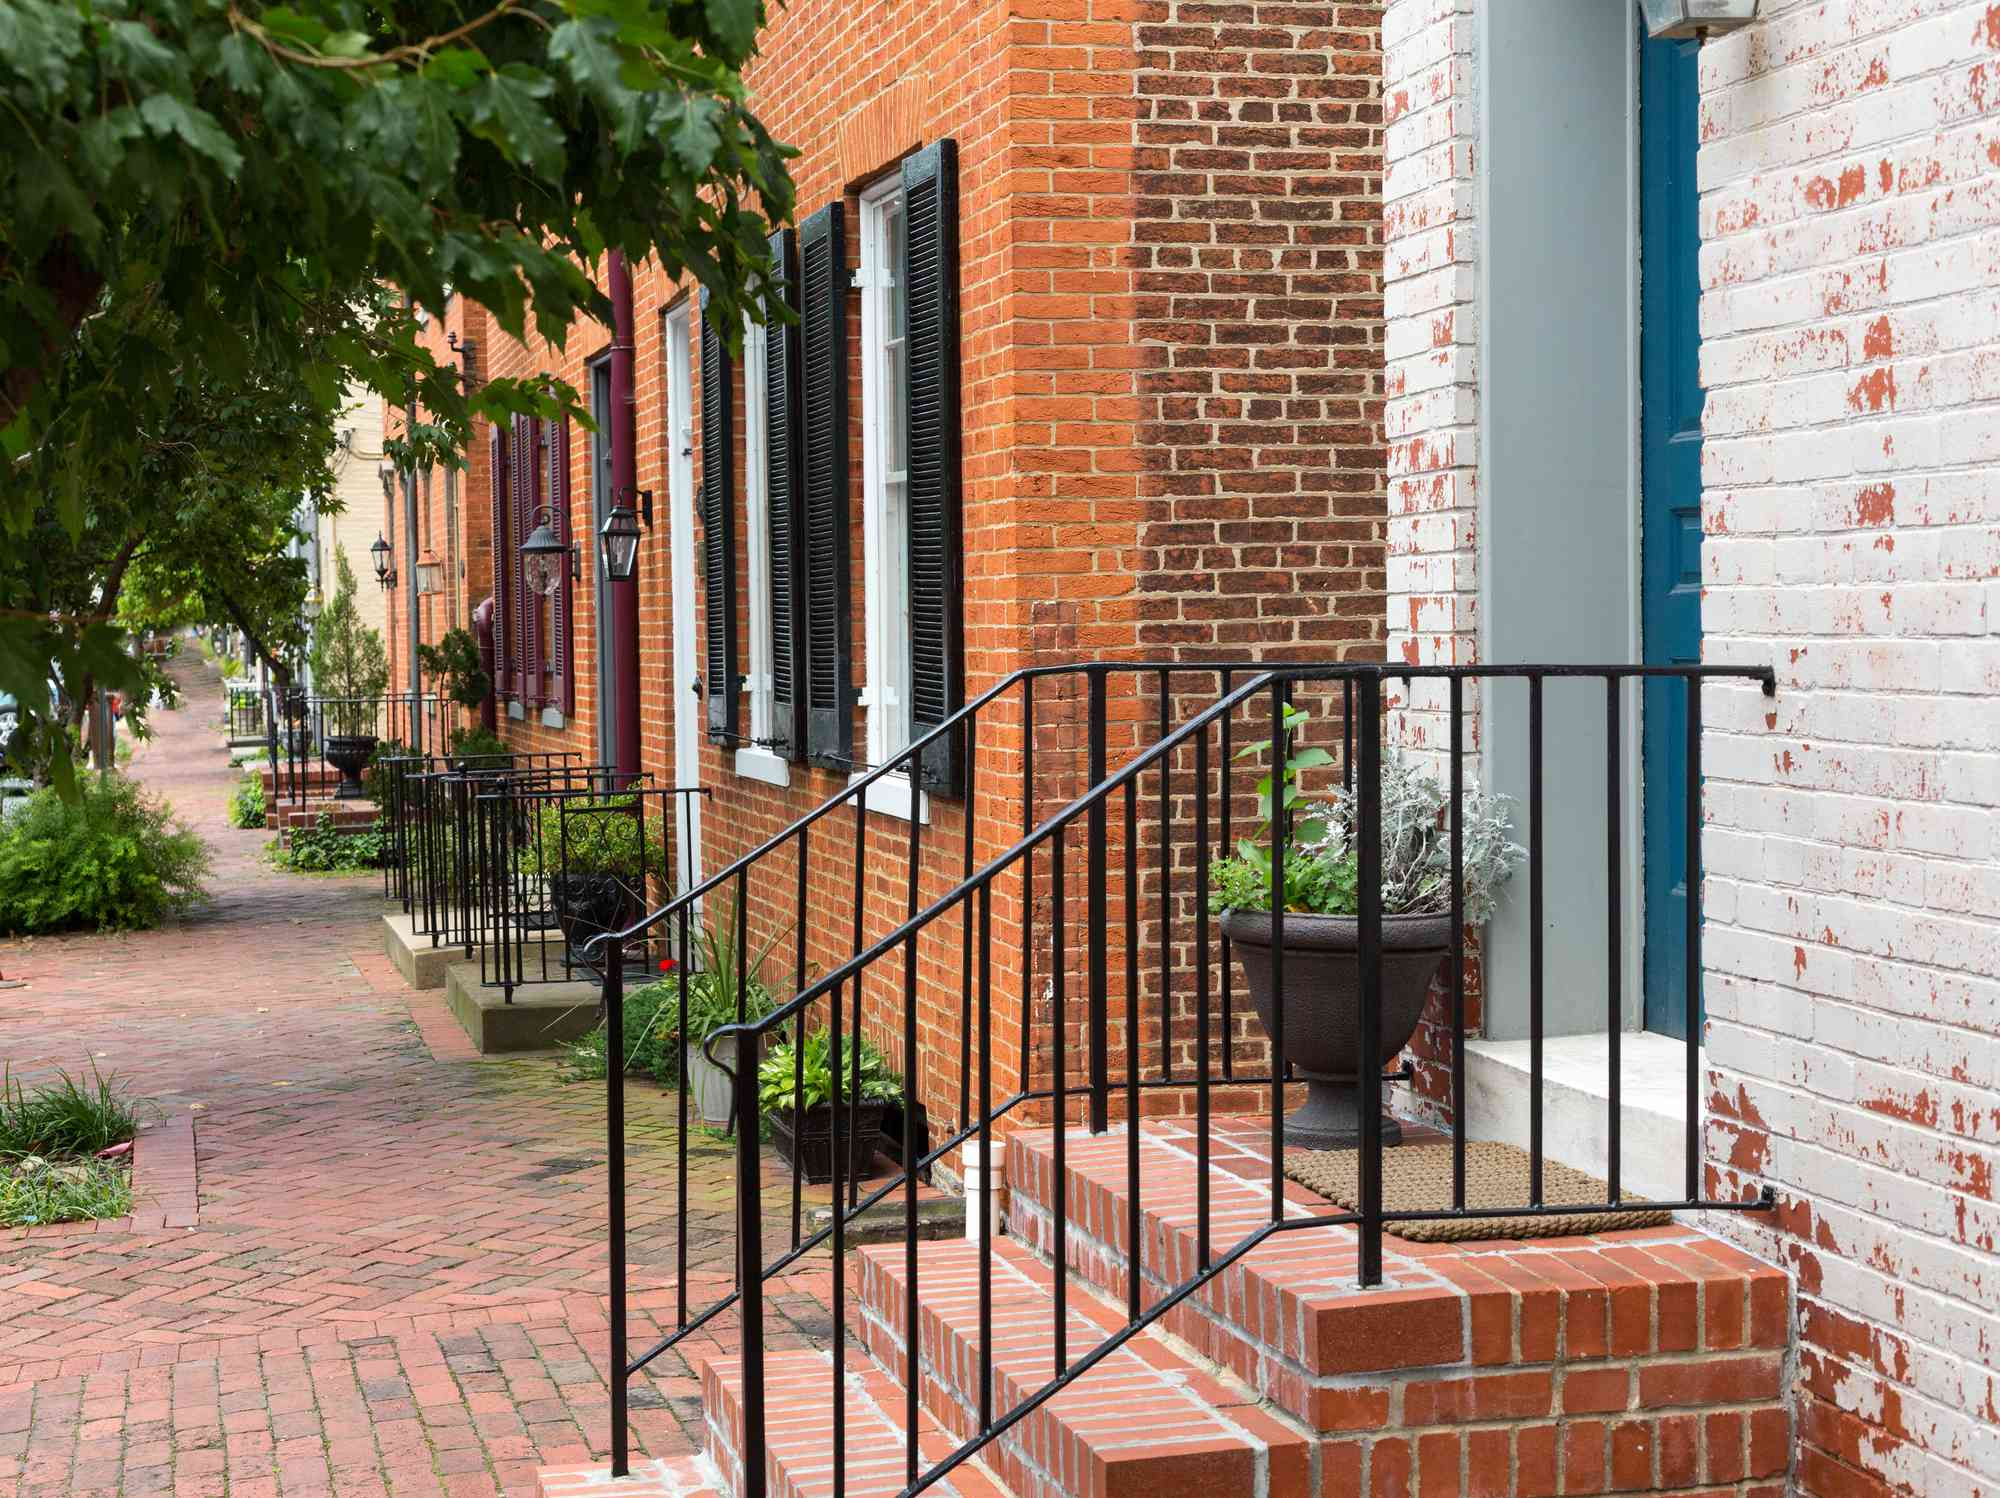 Street scene in Frederick Maryland